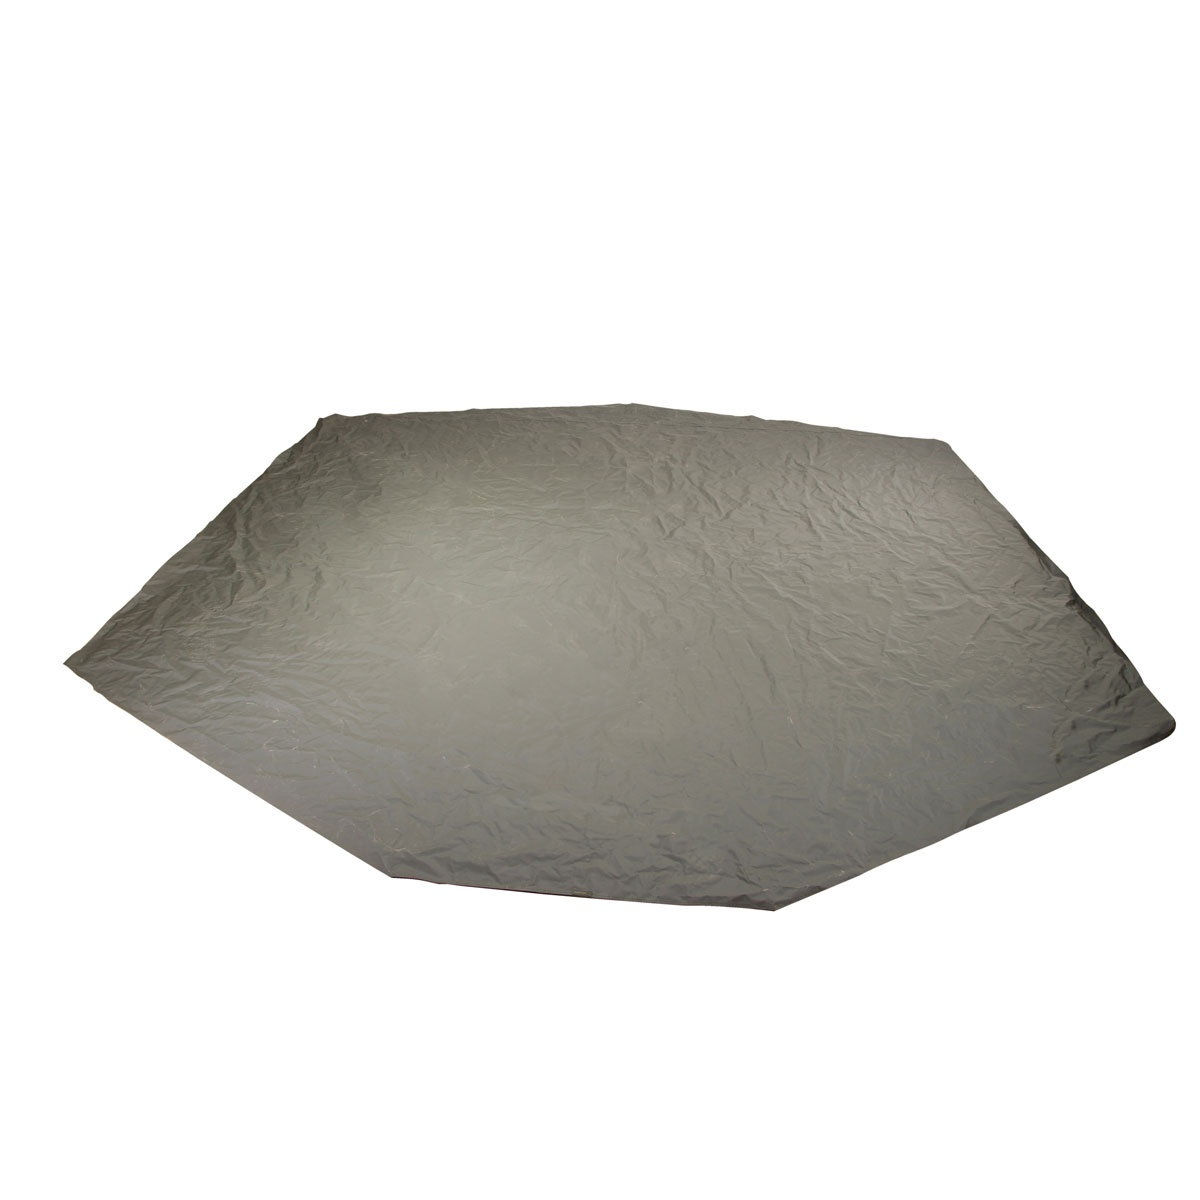 Namiot karpiowy nash tytan T1+podłoga,sypialnia i narzuta